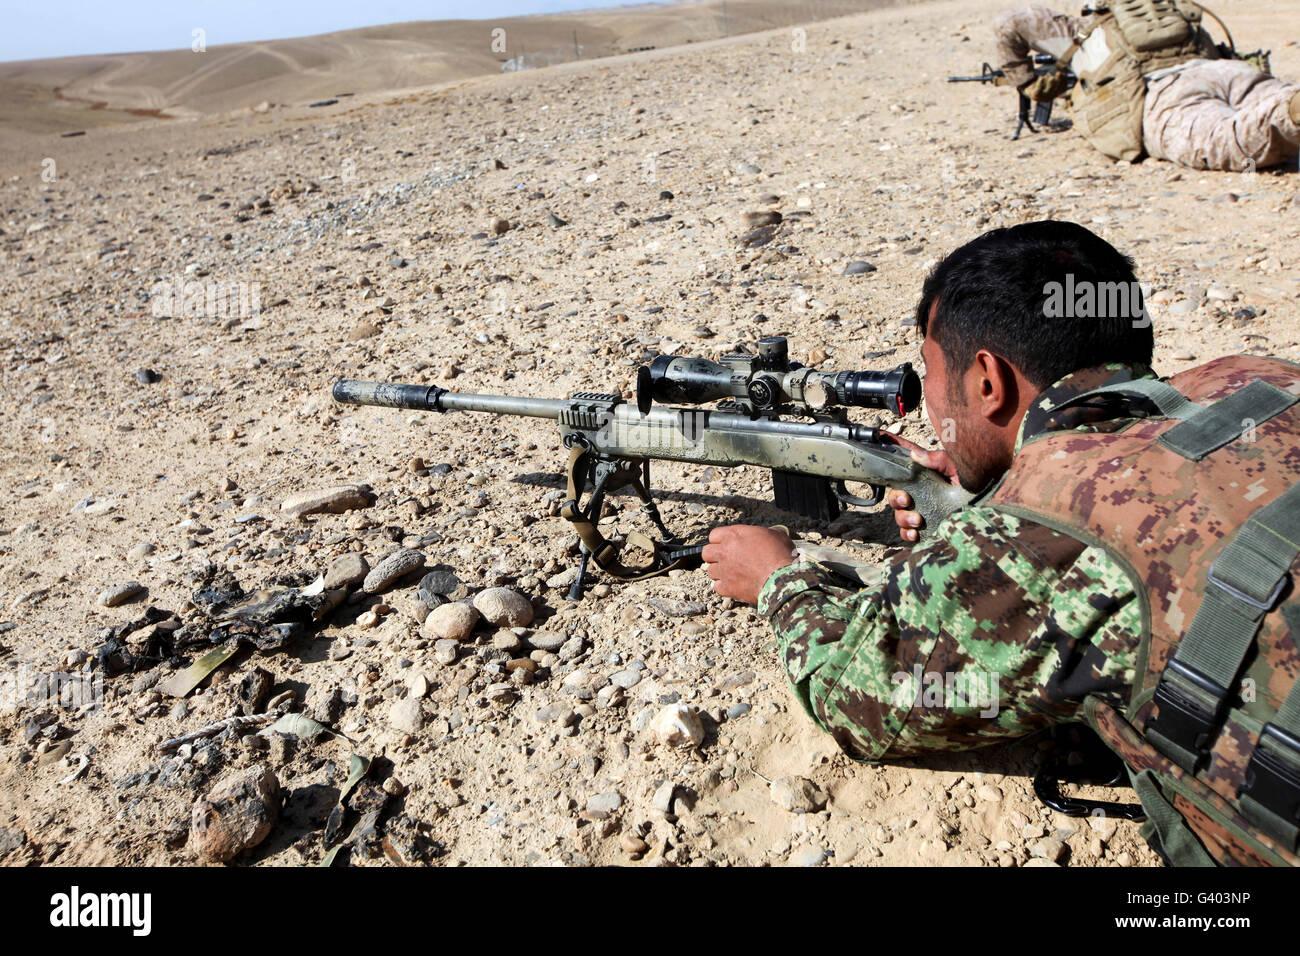 Ein Afghan National Army Soldat feuert eine M40A5 Gewehr. Stockbild